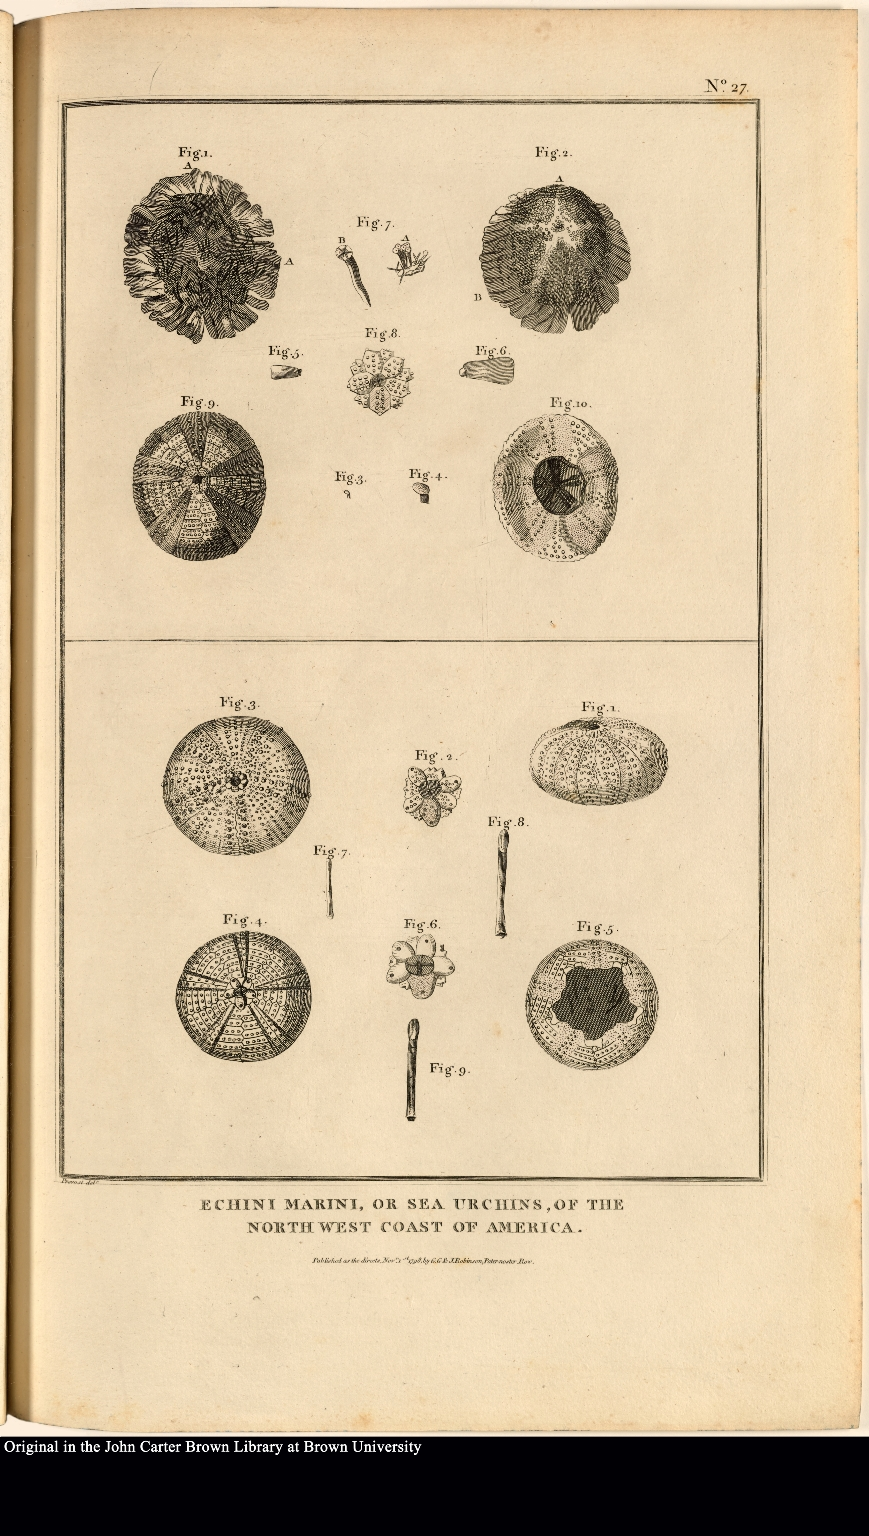 Echini Marini, or sea urchins, of the north west coast of America.